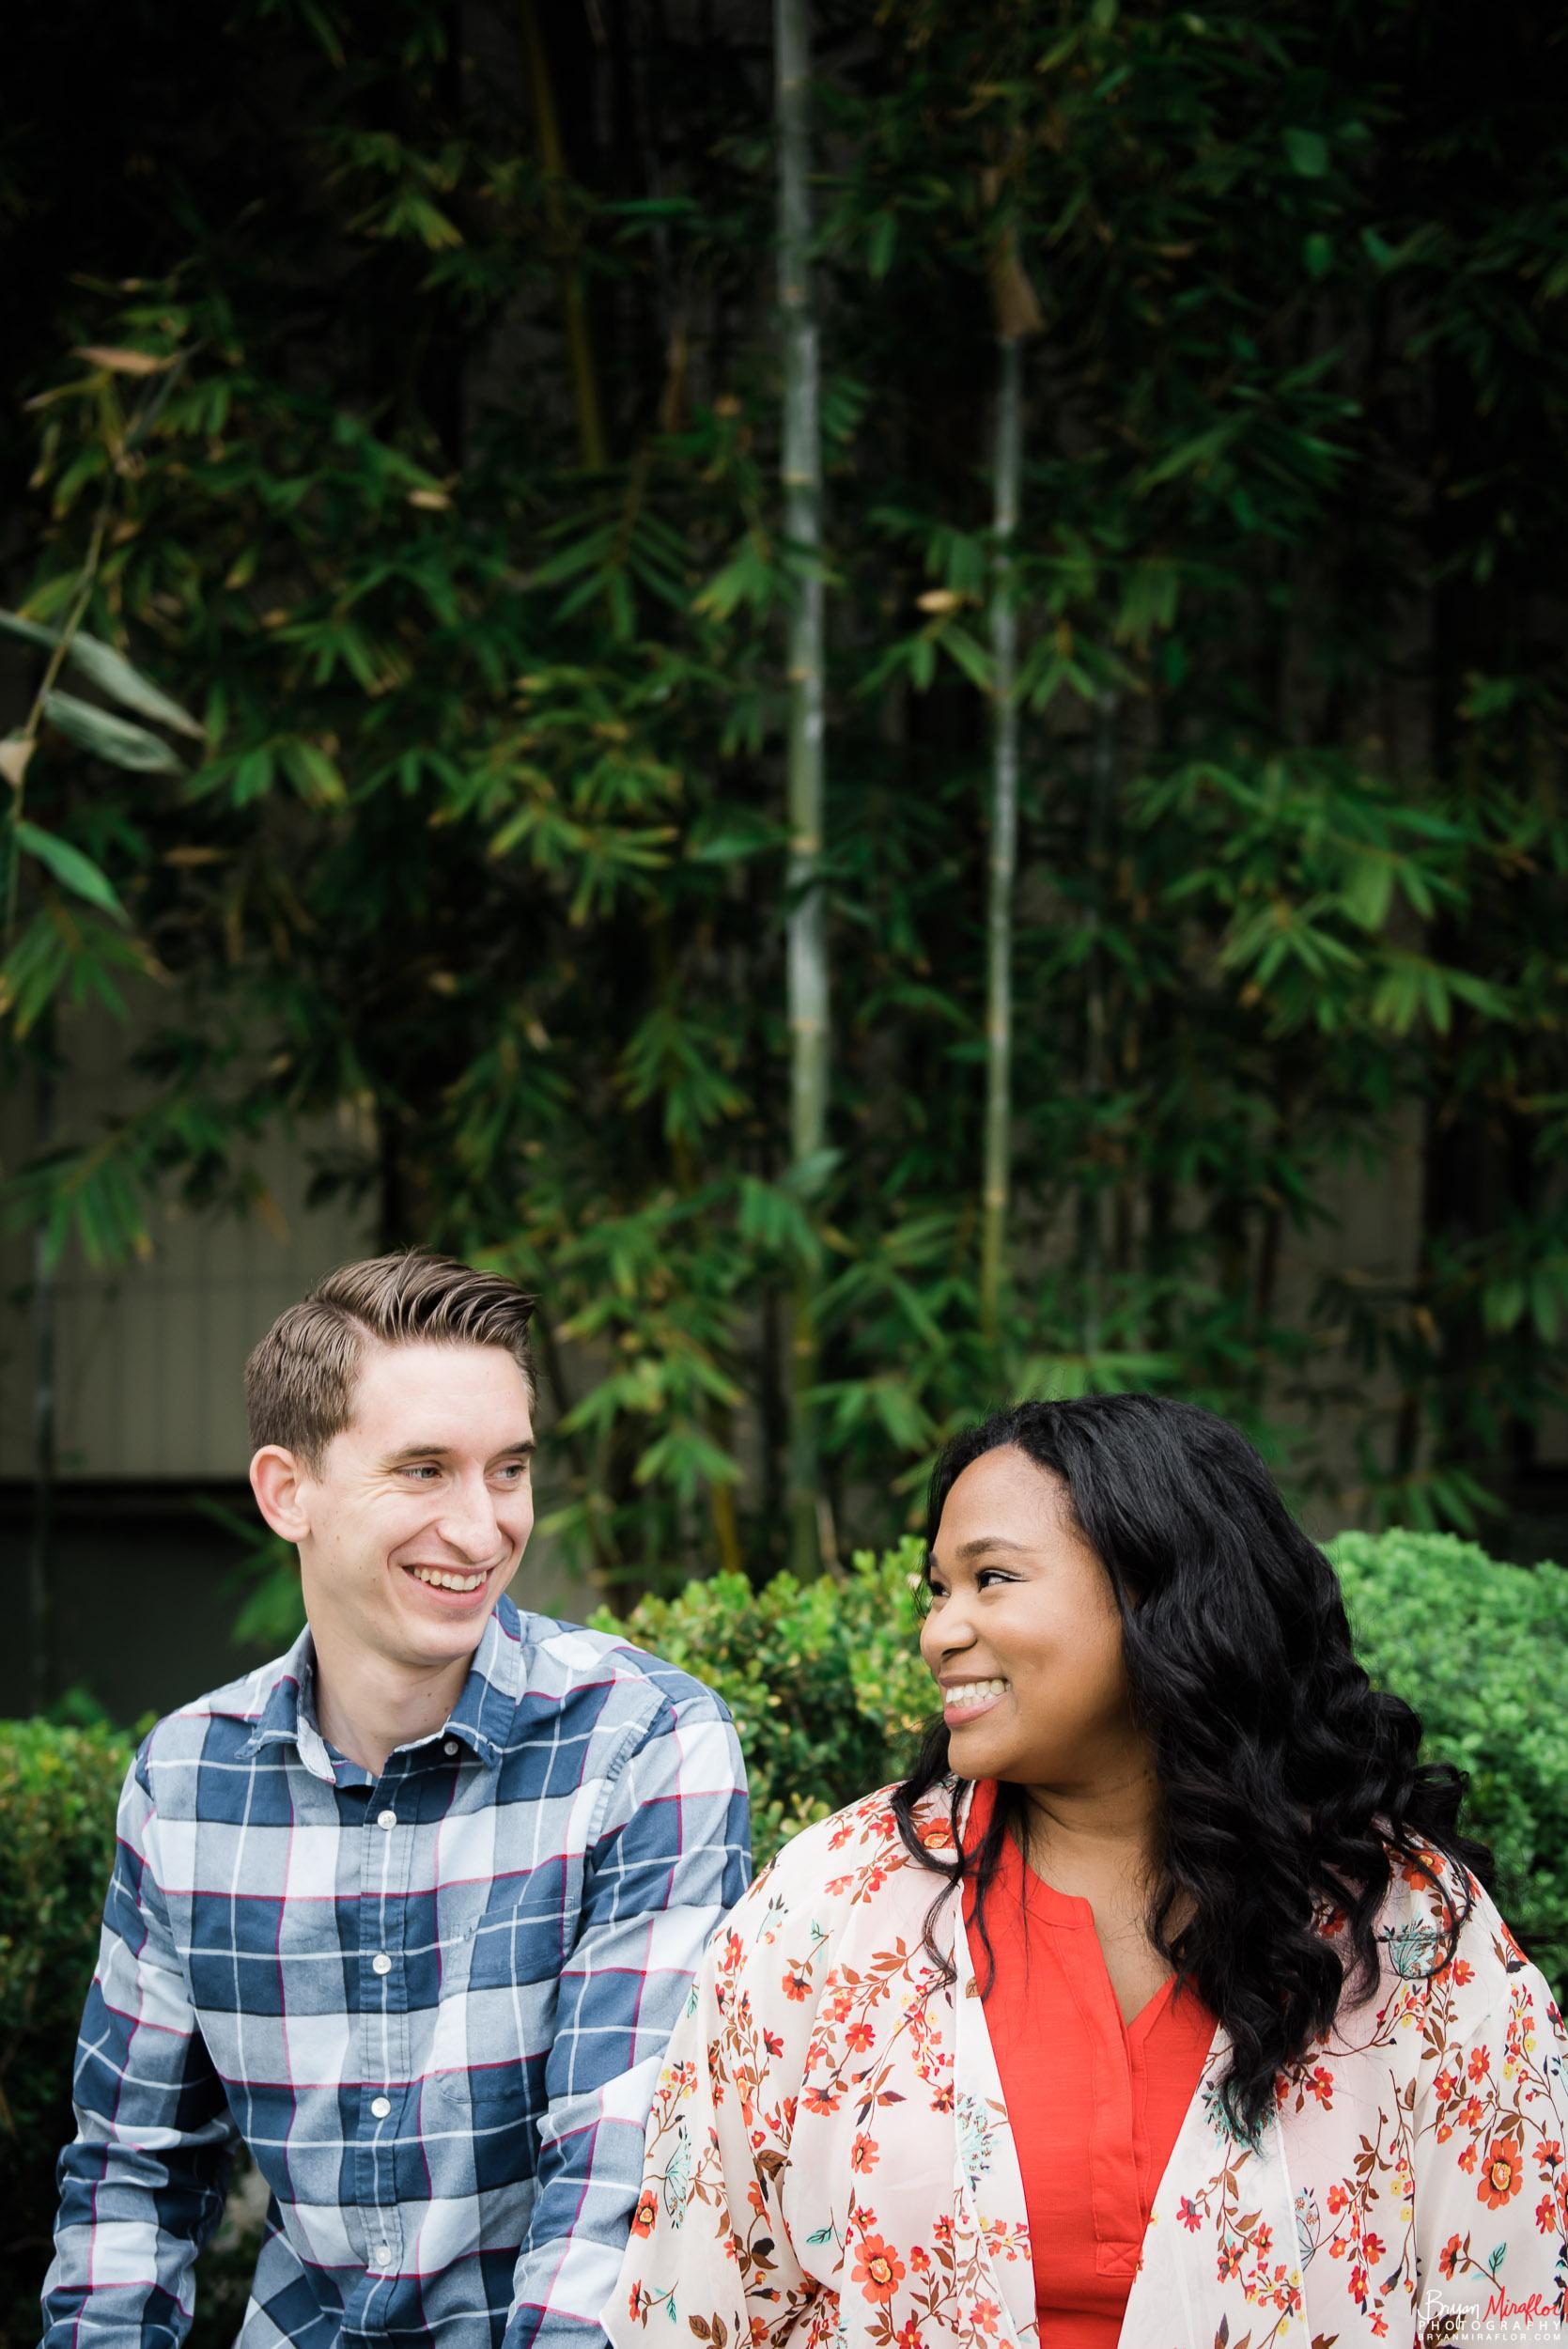 Bryan-Miraflor-Photography-Vanessa-Tommy-LACMA-DTLA-Engagement-Photoshoot-20161210-02.jpg